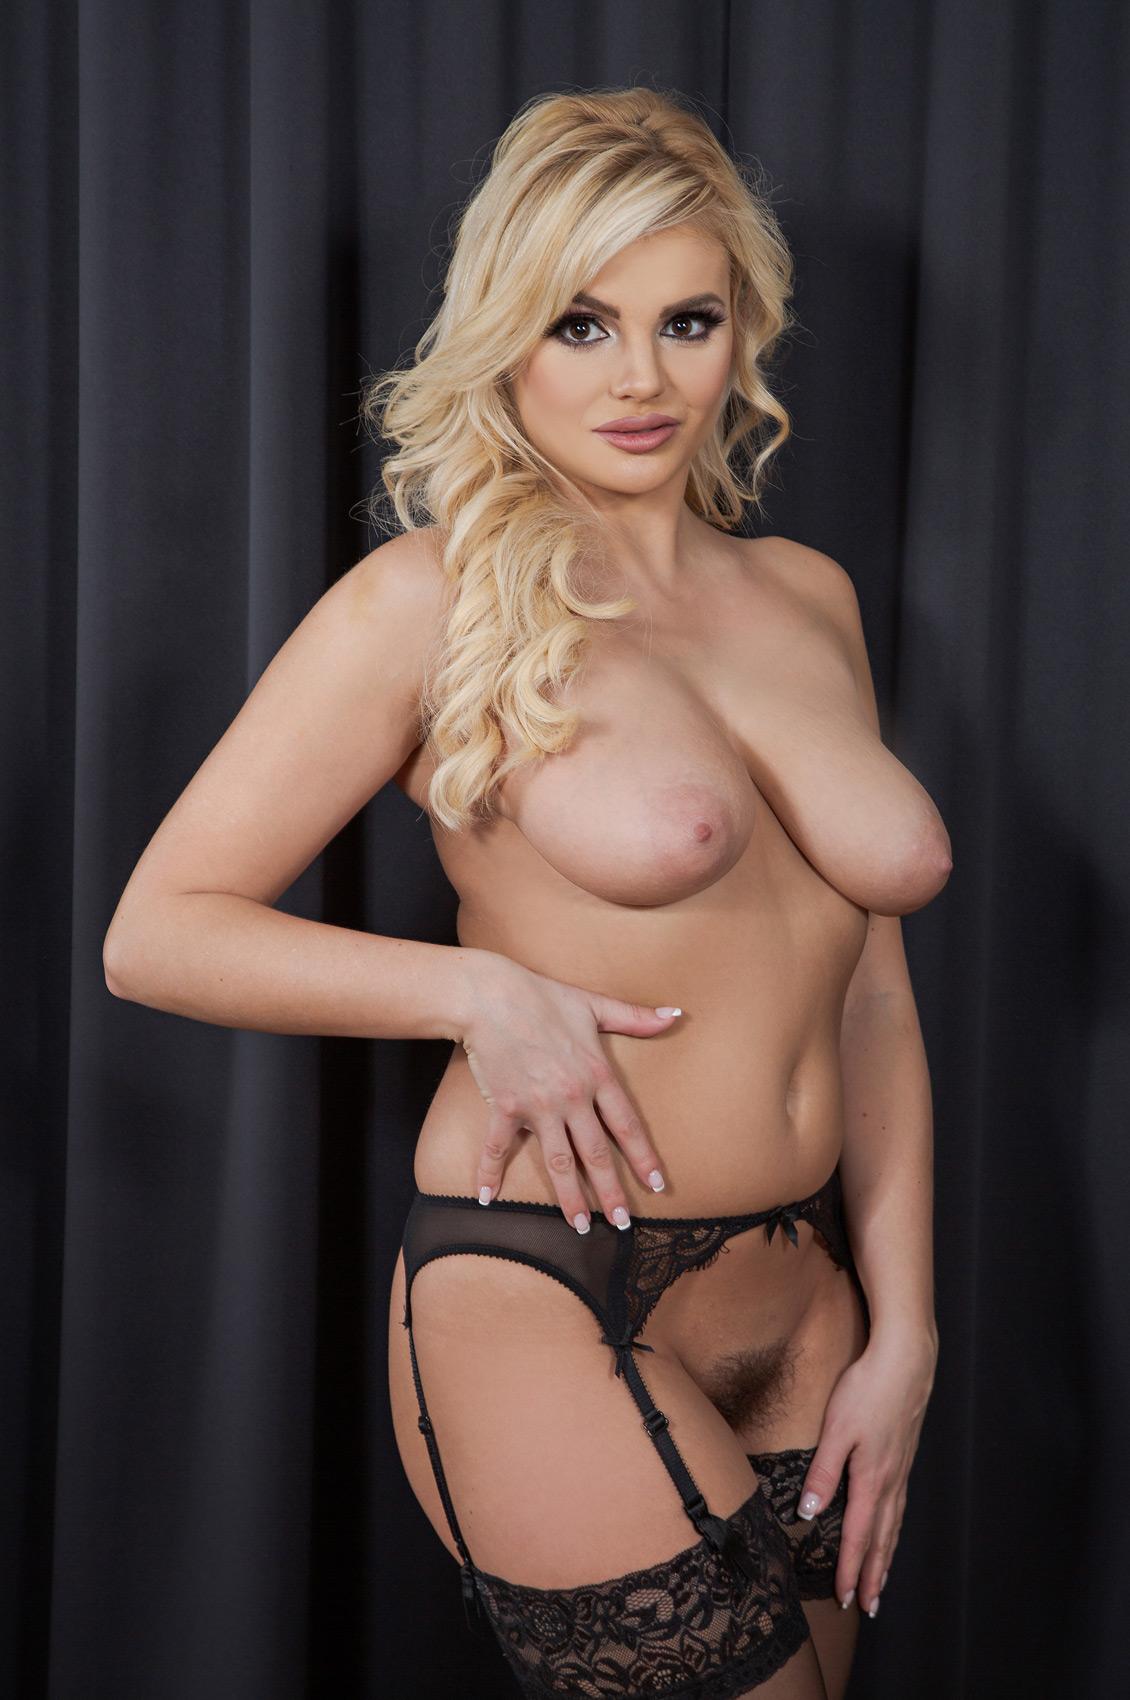 Katy Jayne's VR Porn Videos, Bio & Free Nude Pics